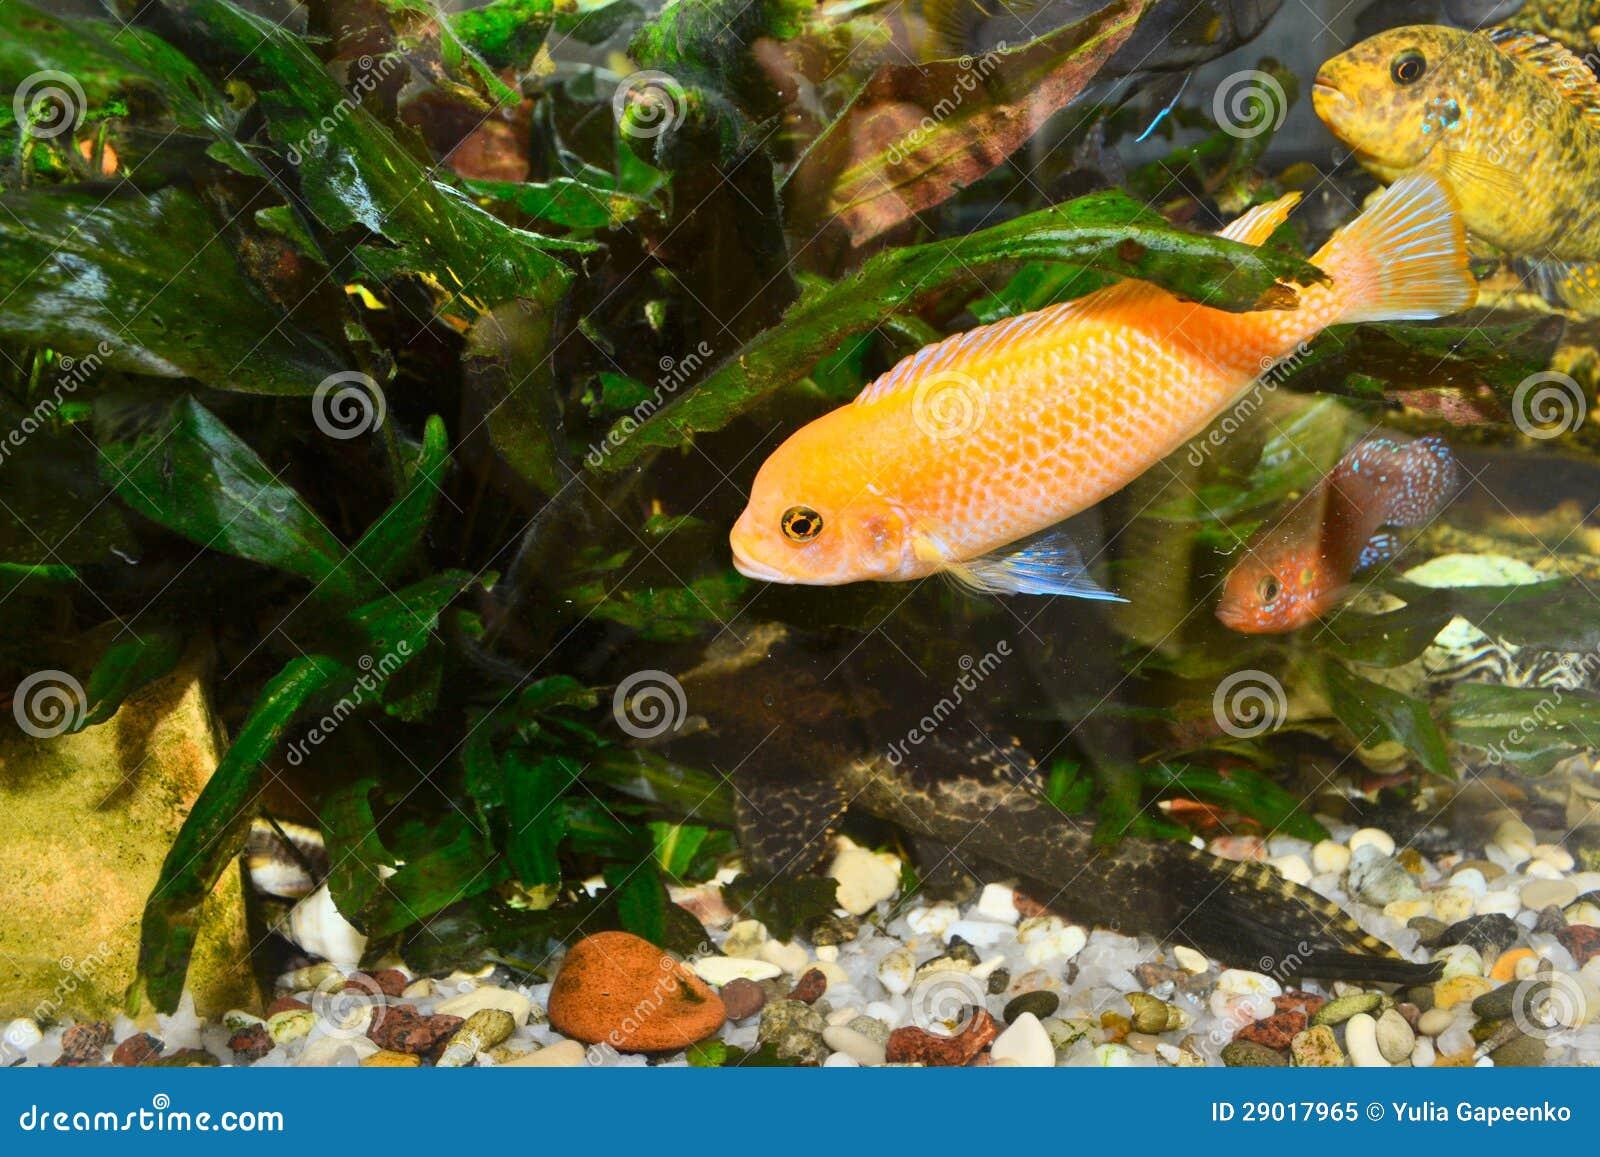 Colorful Aquarium With Fish Royalty Free Stock Photo